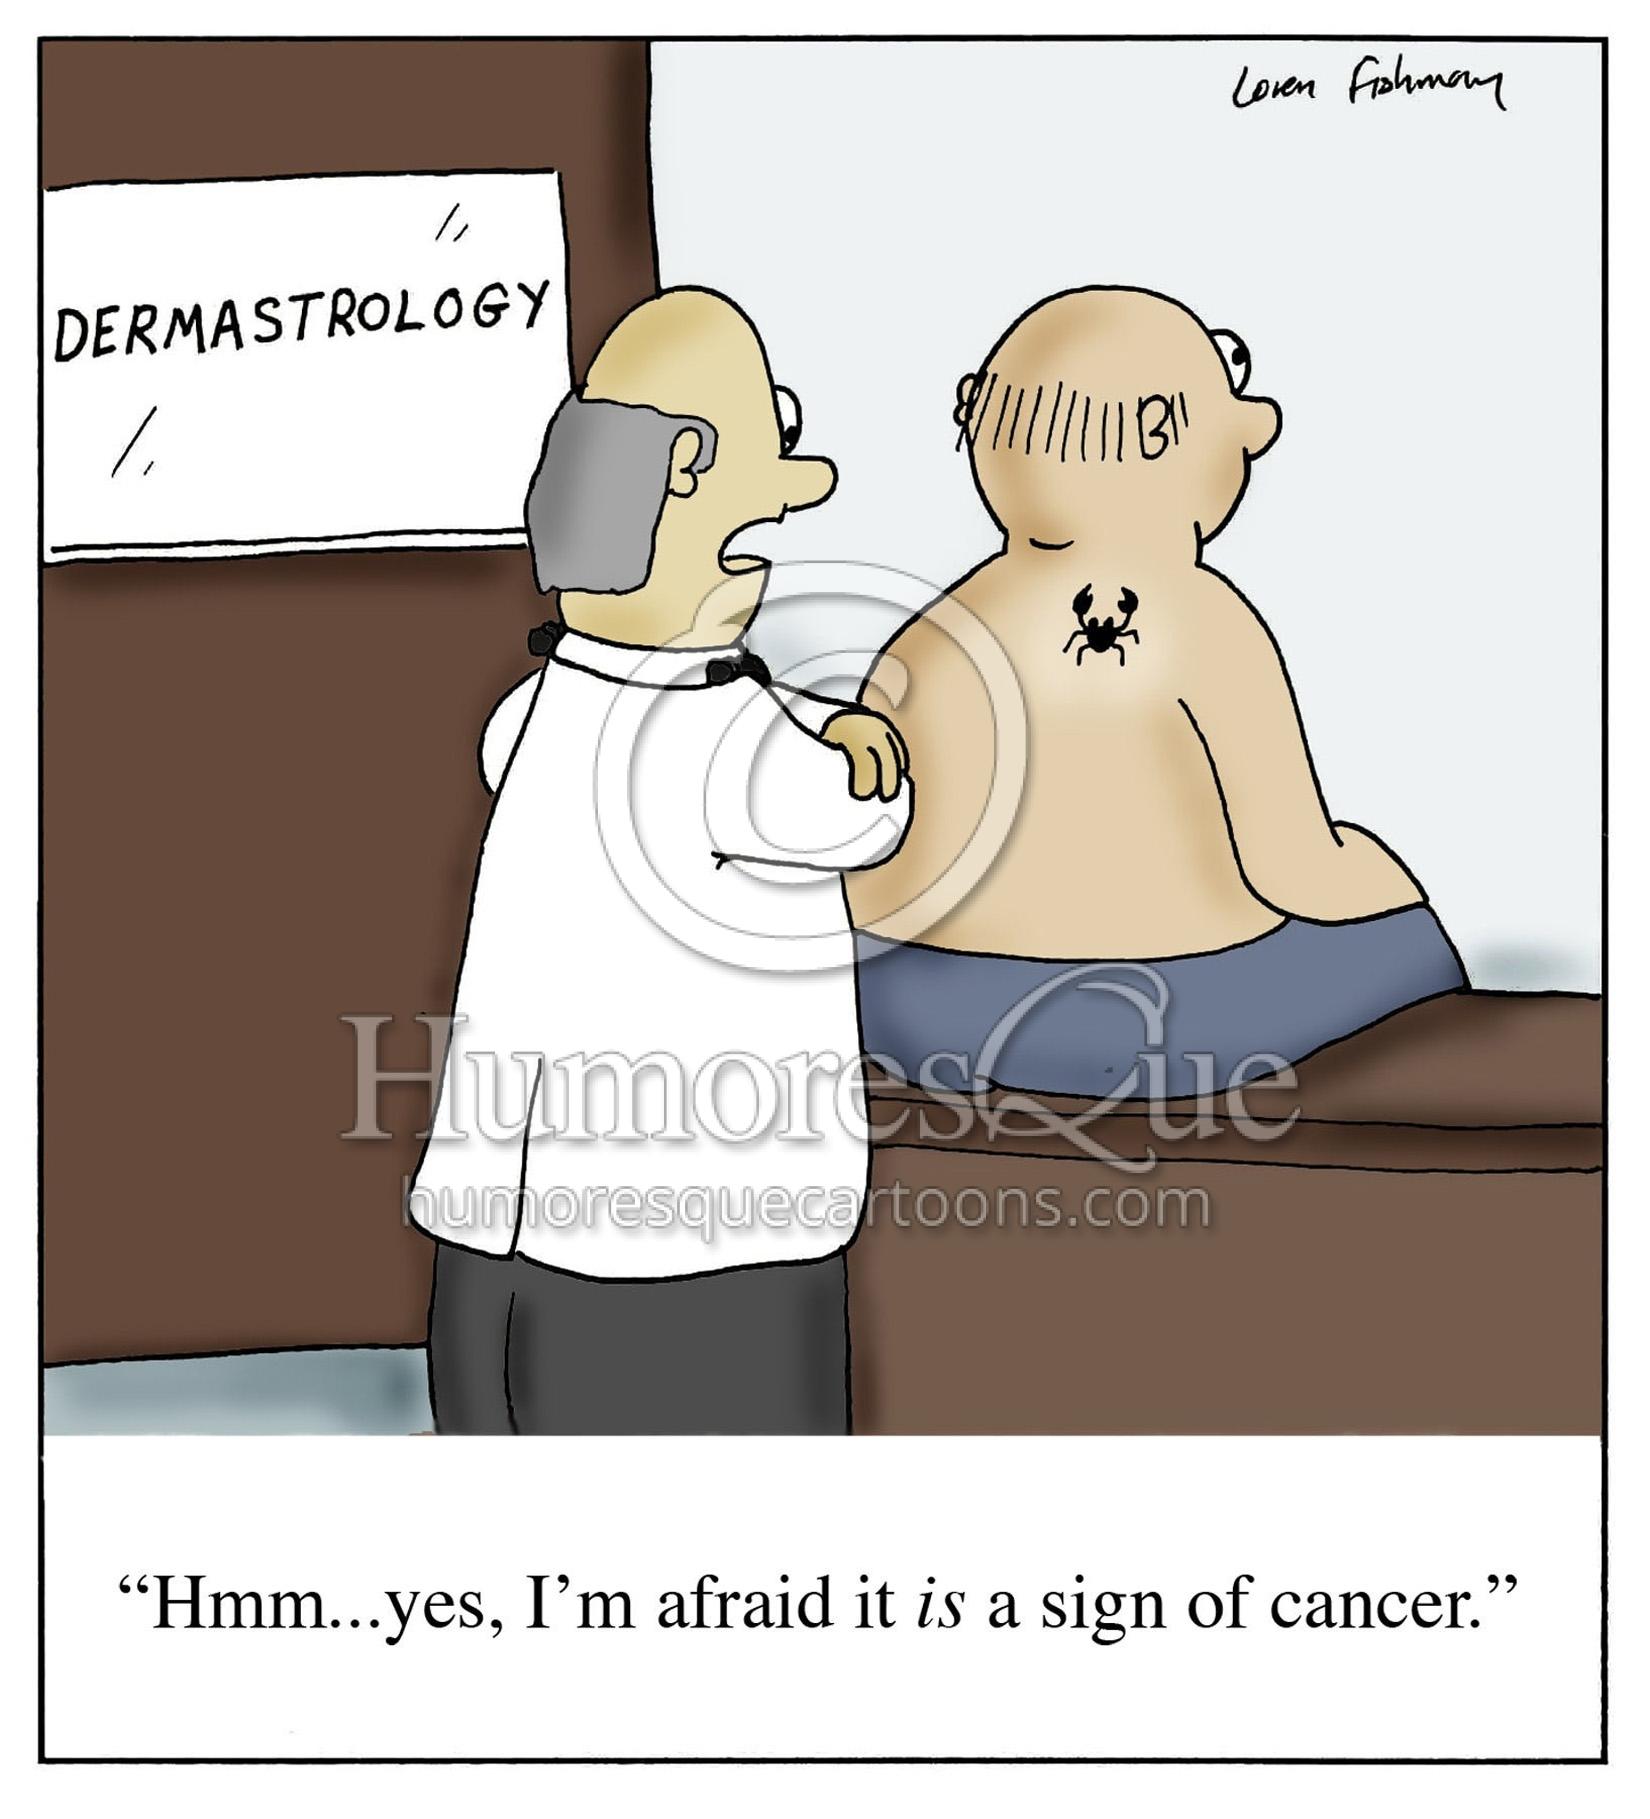 dermastrology mole is a sign of cancer dermatology astrology cartoon